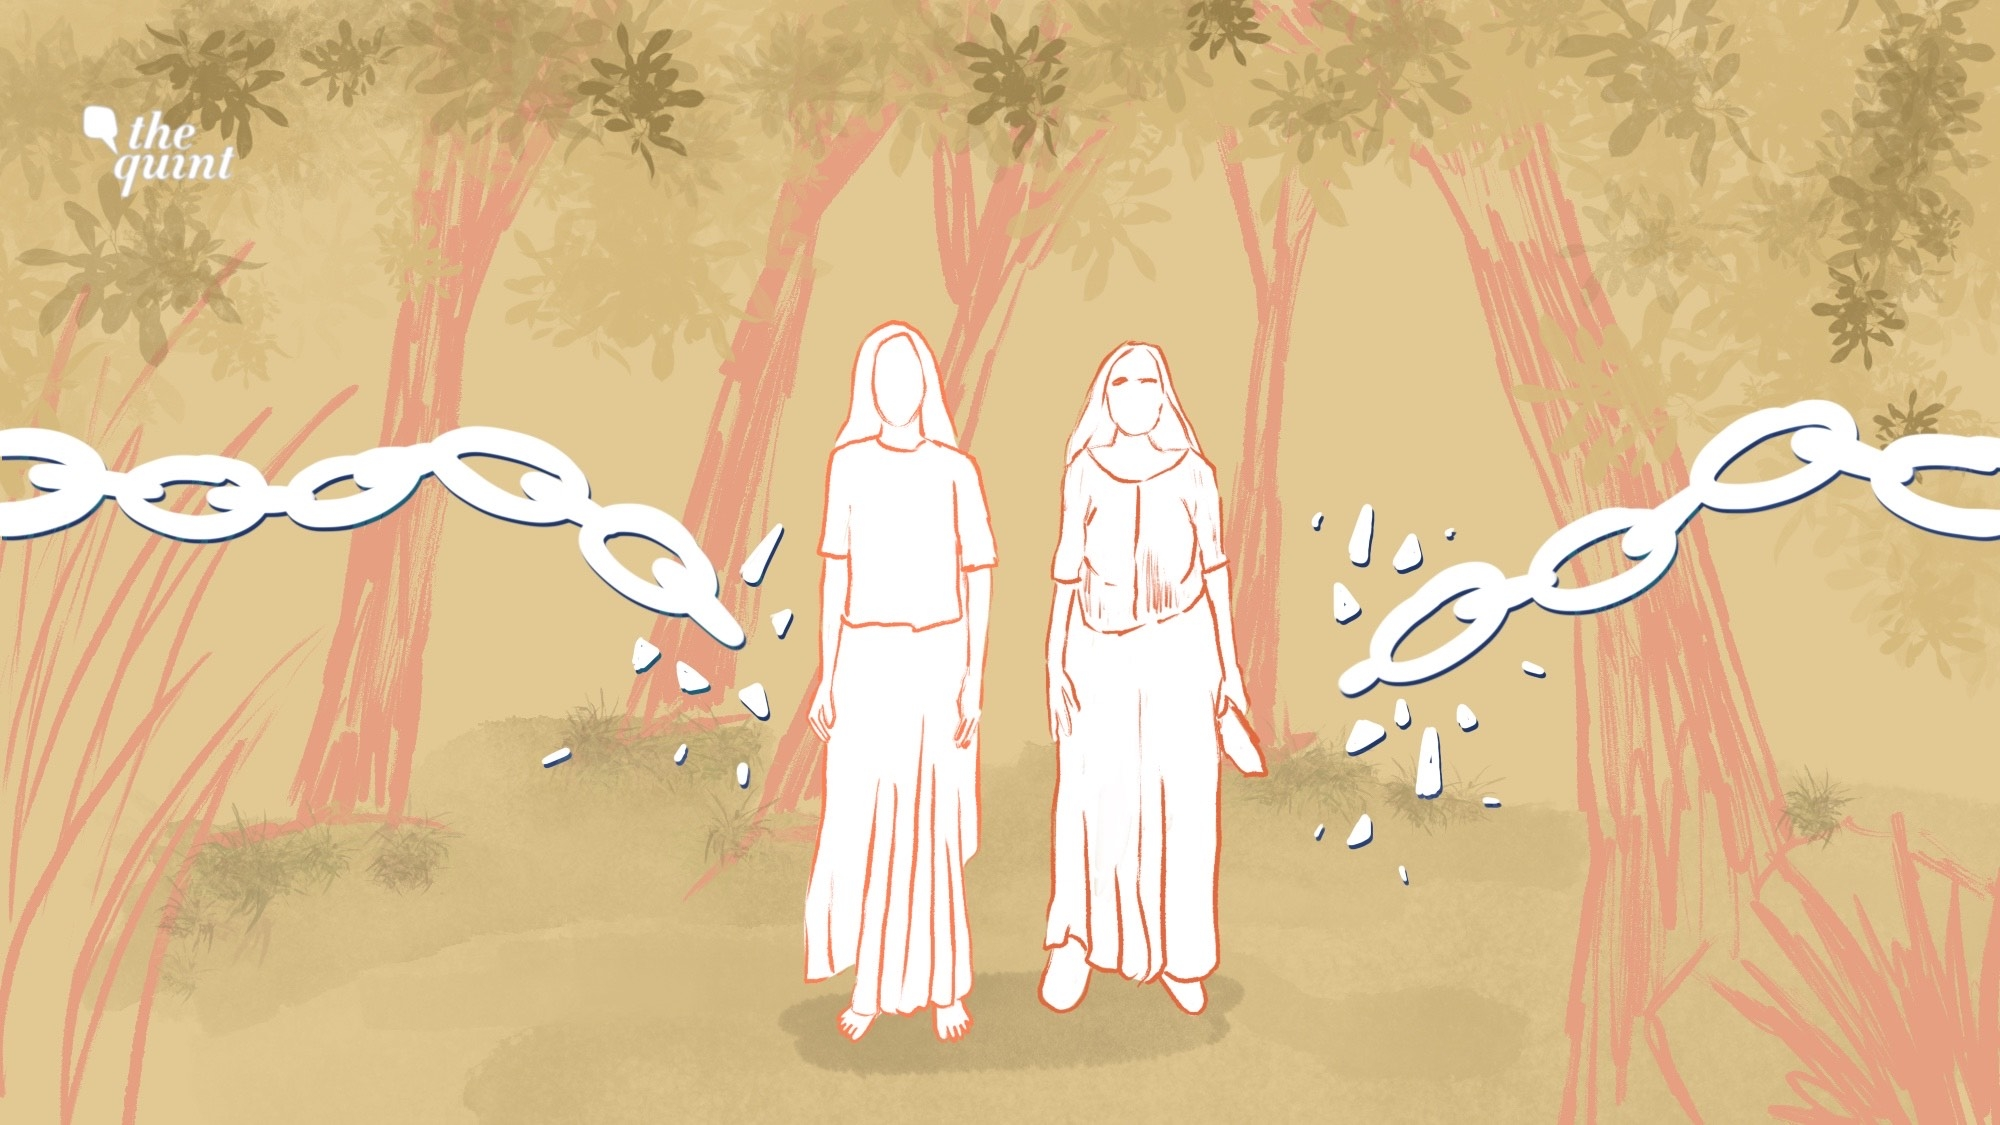 How 2 Tribal Women Fled Debt Bondage, Rape Amid Lockdown in B'luru